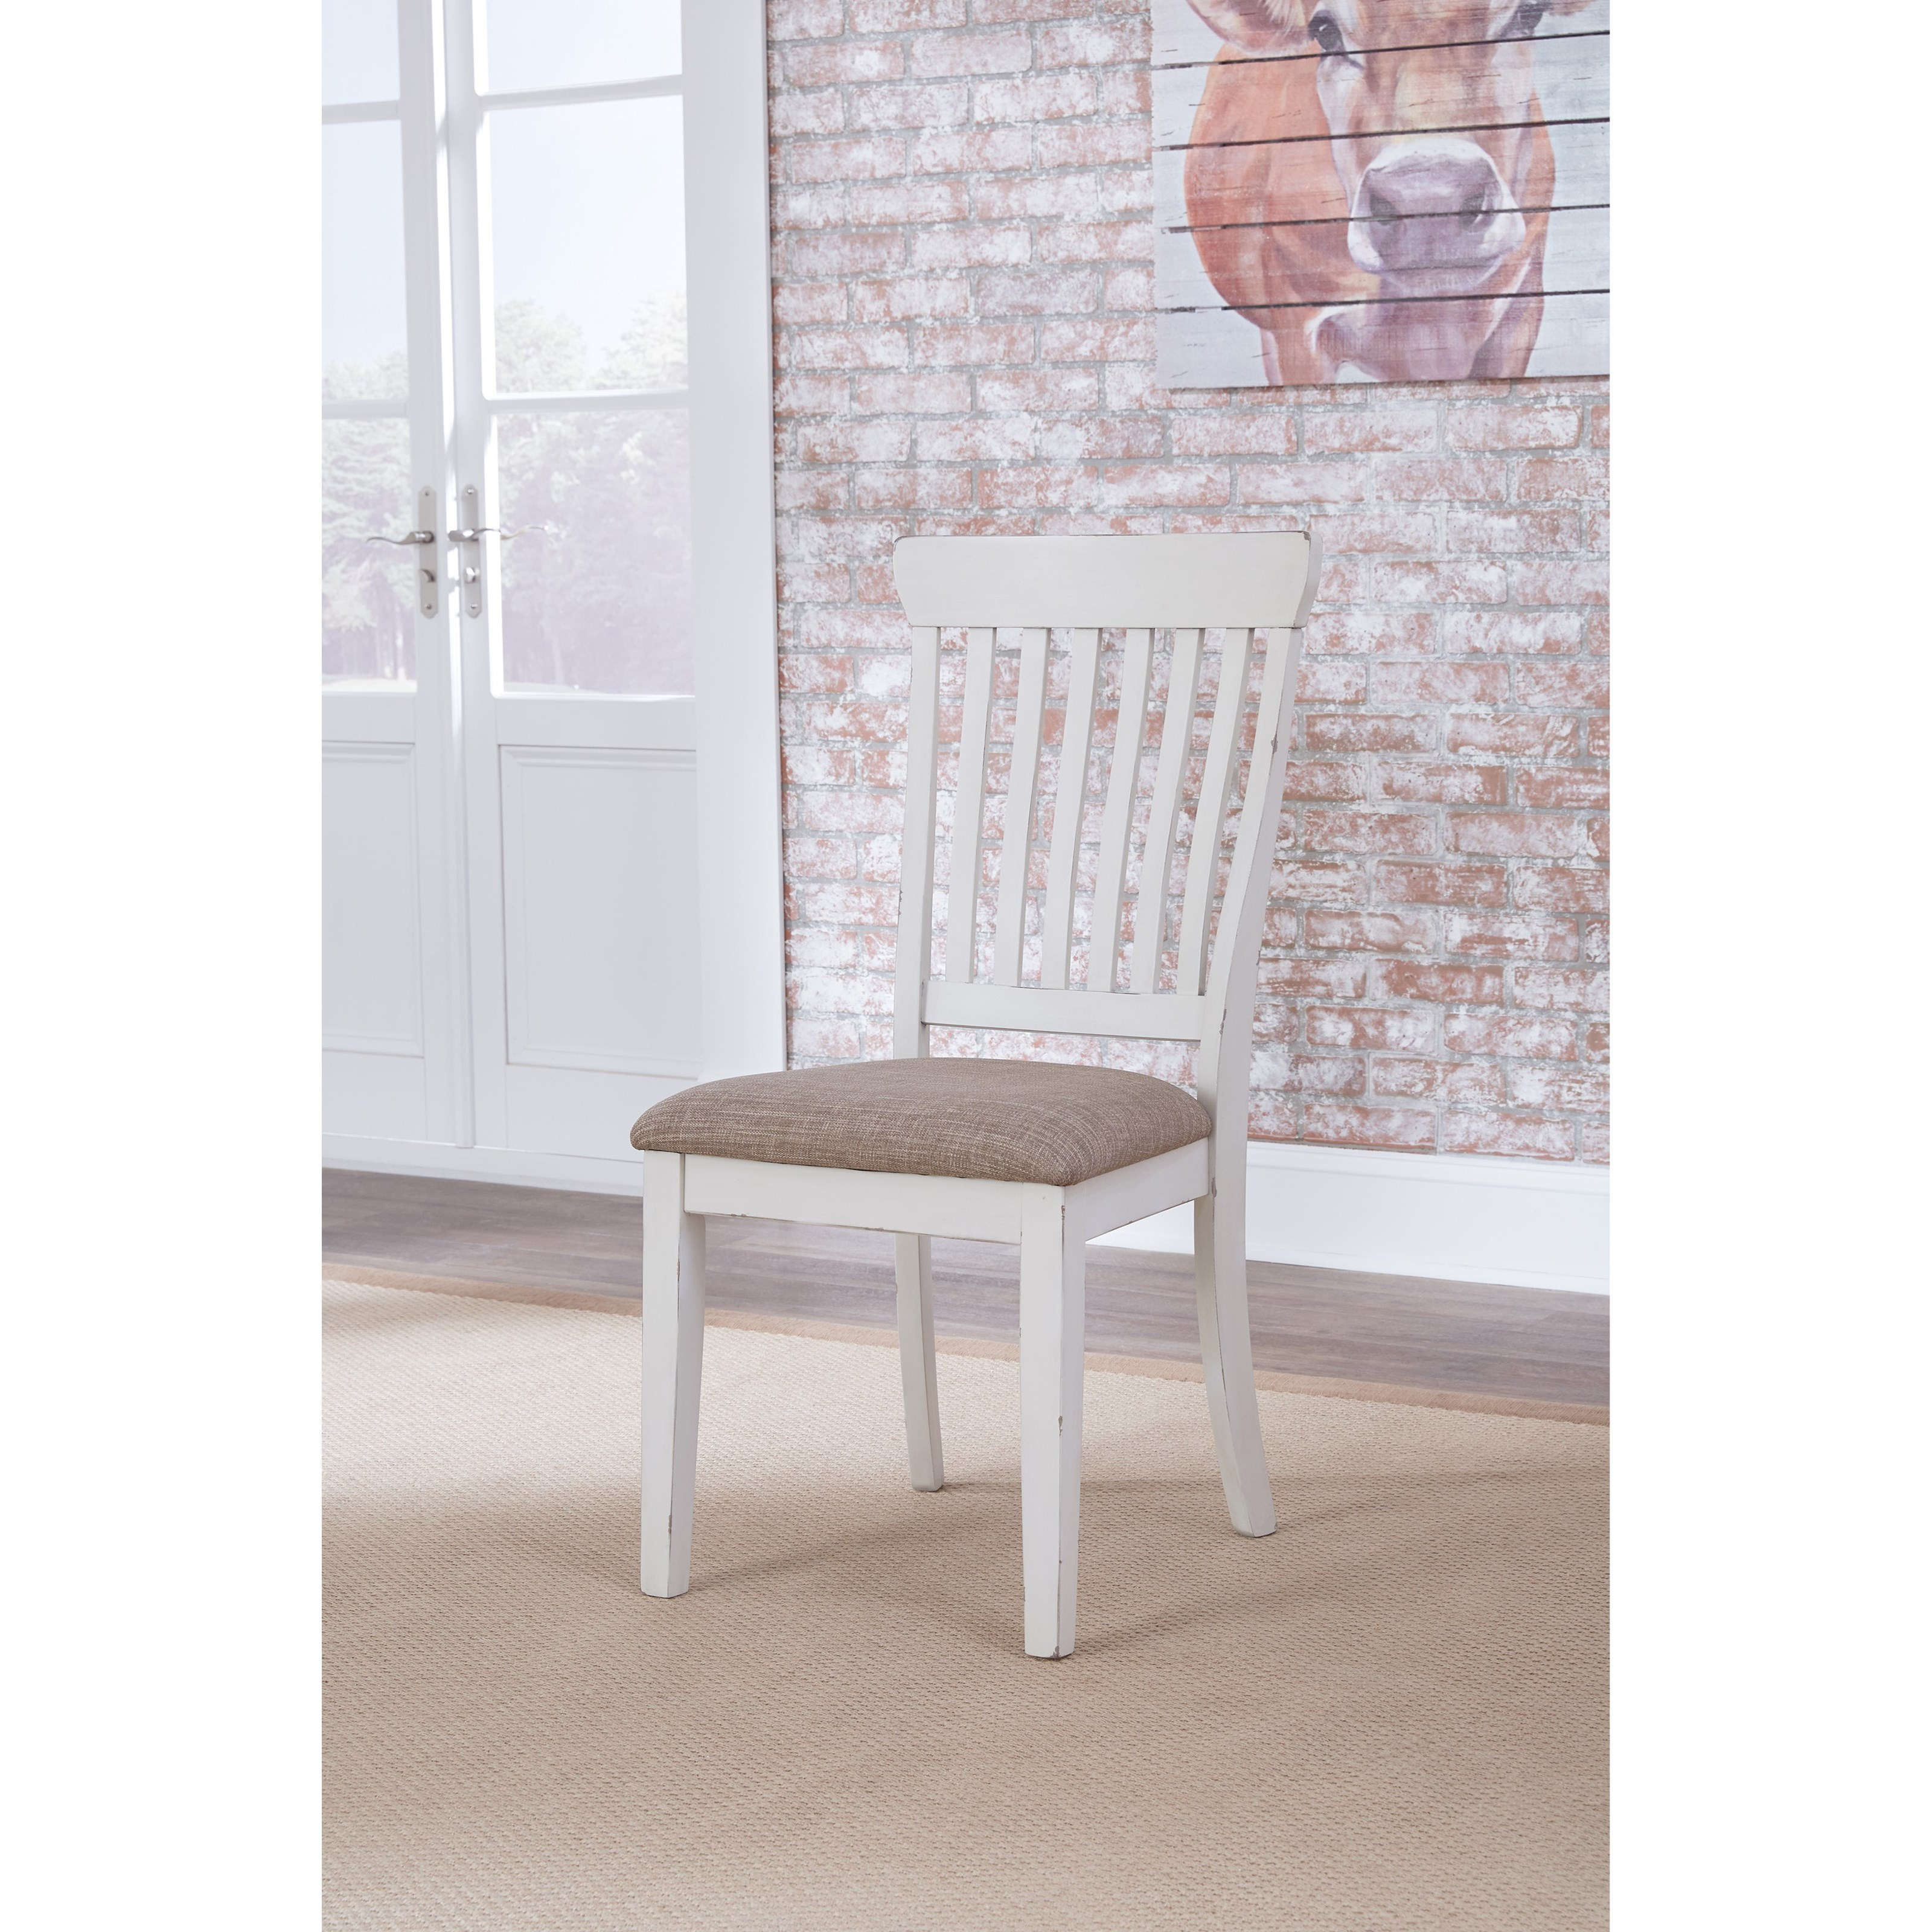 Danbeck Dining Chair: Ashley Signature Design Danbeck D603-01 Dining Upholstered